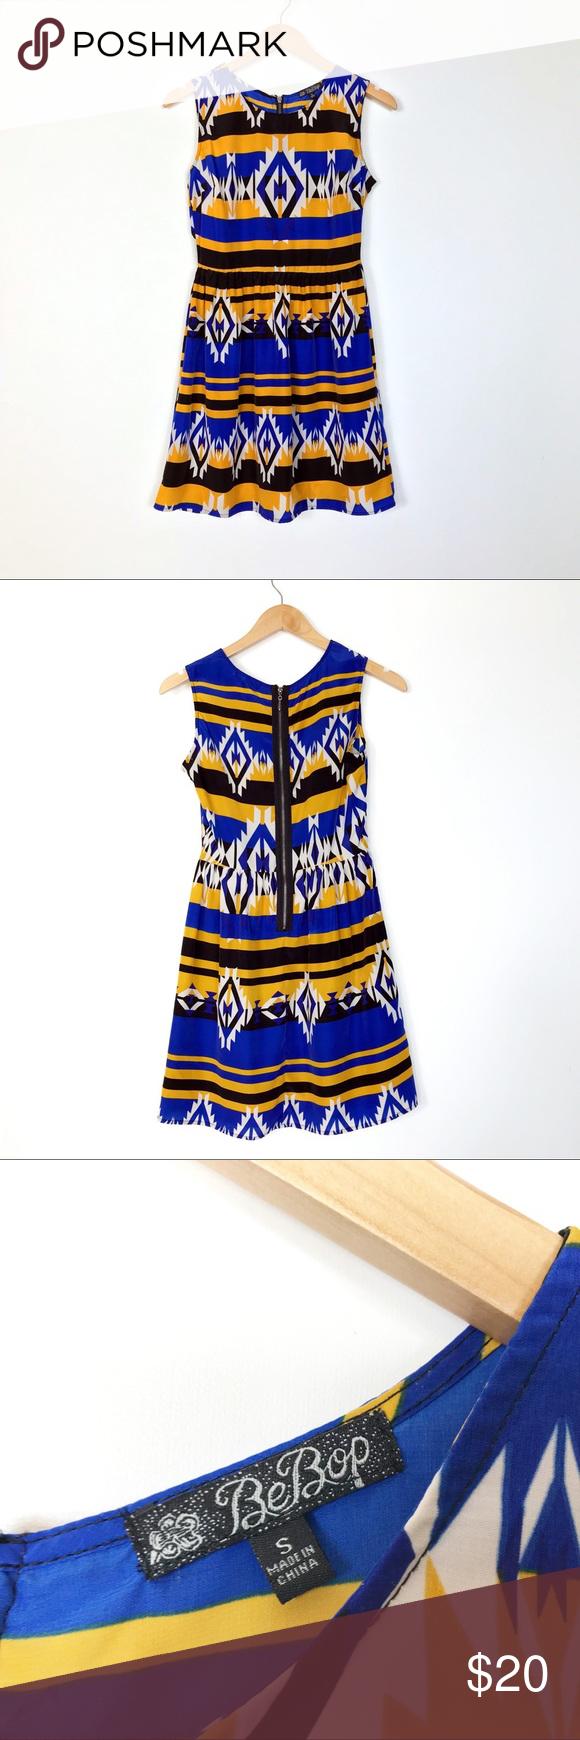 Bebop Aztec Tribal Print Blue Yellow Dress S Fashion Blue And Yellow Dress Clothes Design [ 1740 x 580 Pixel ]